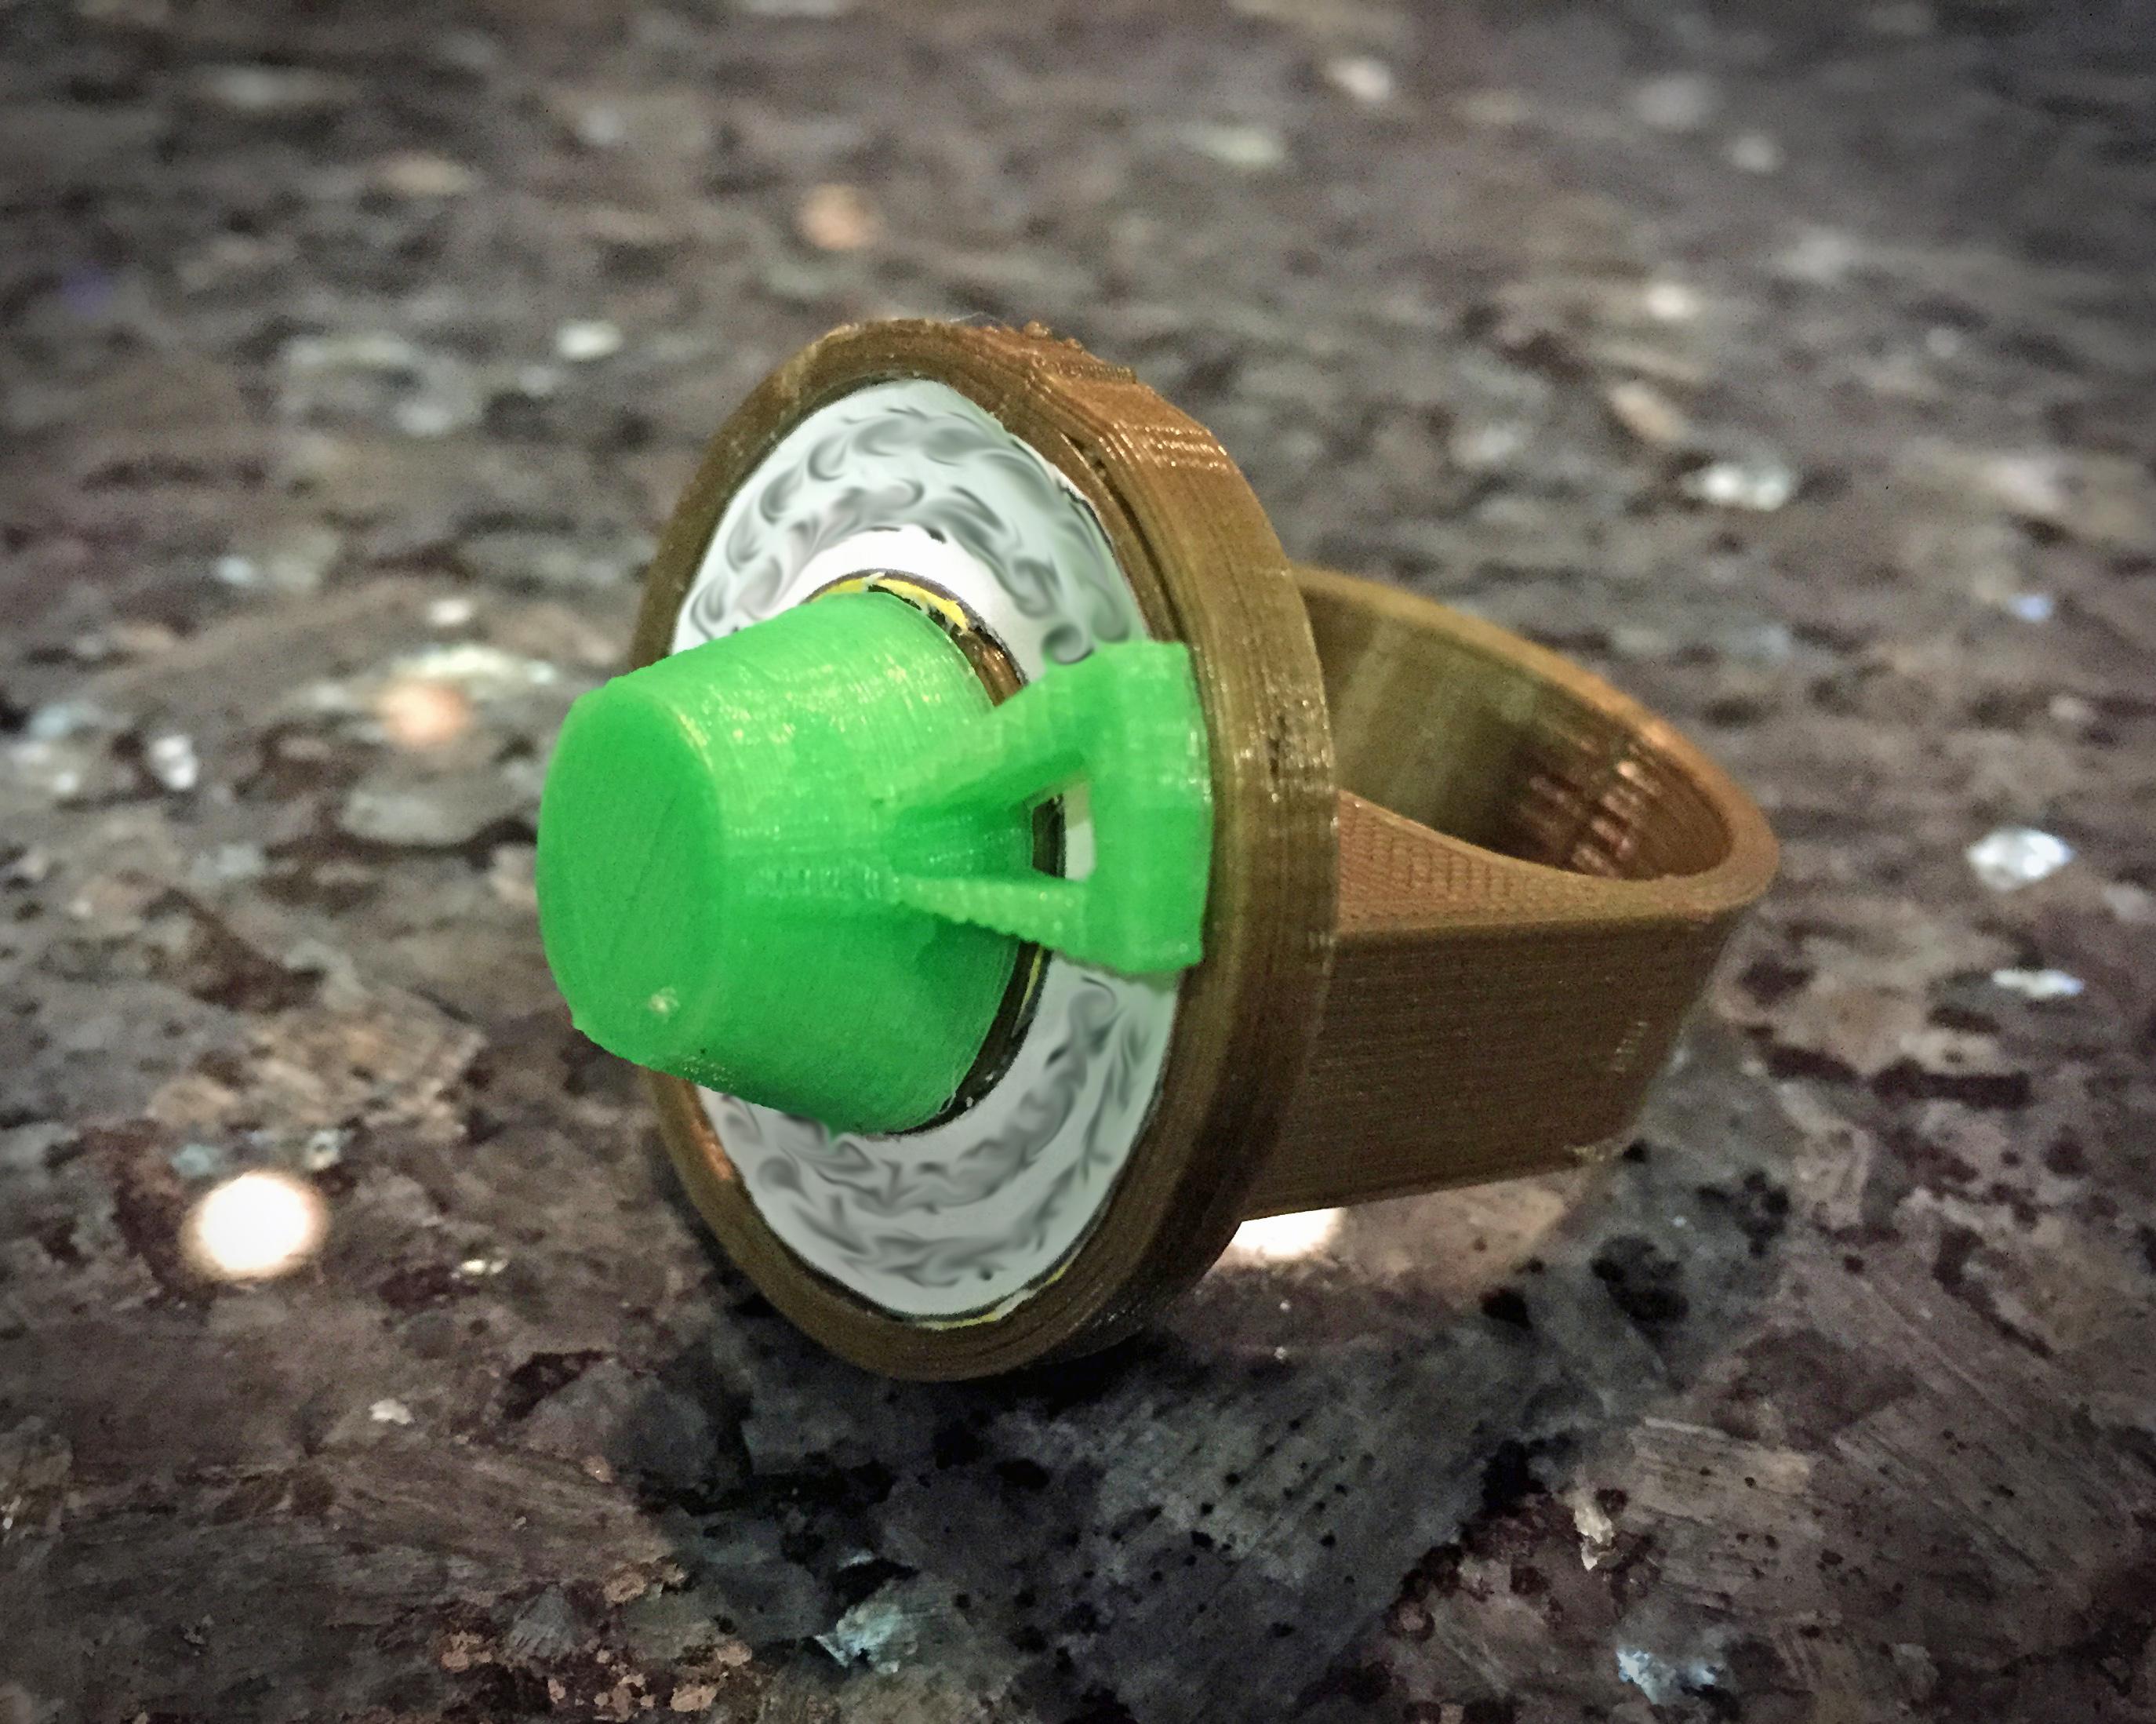 Secret Decoder Ring Toy